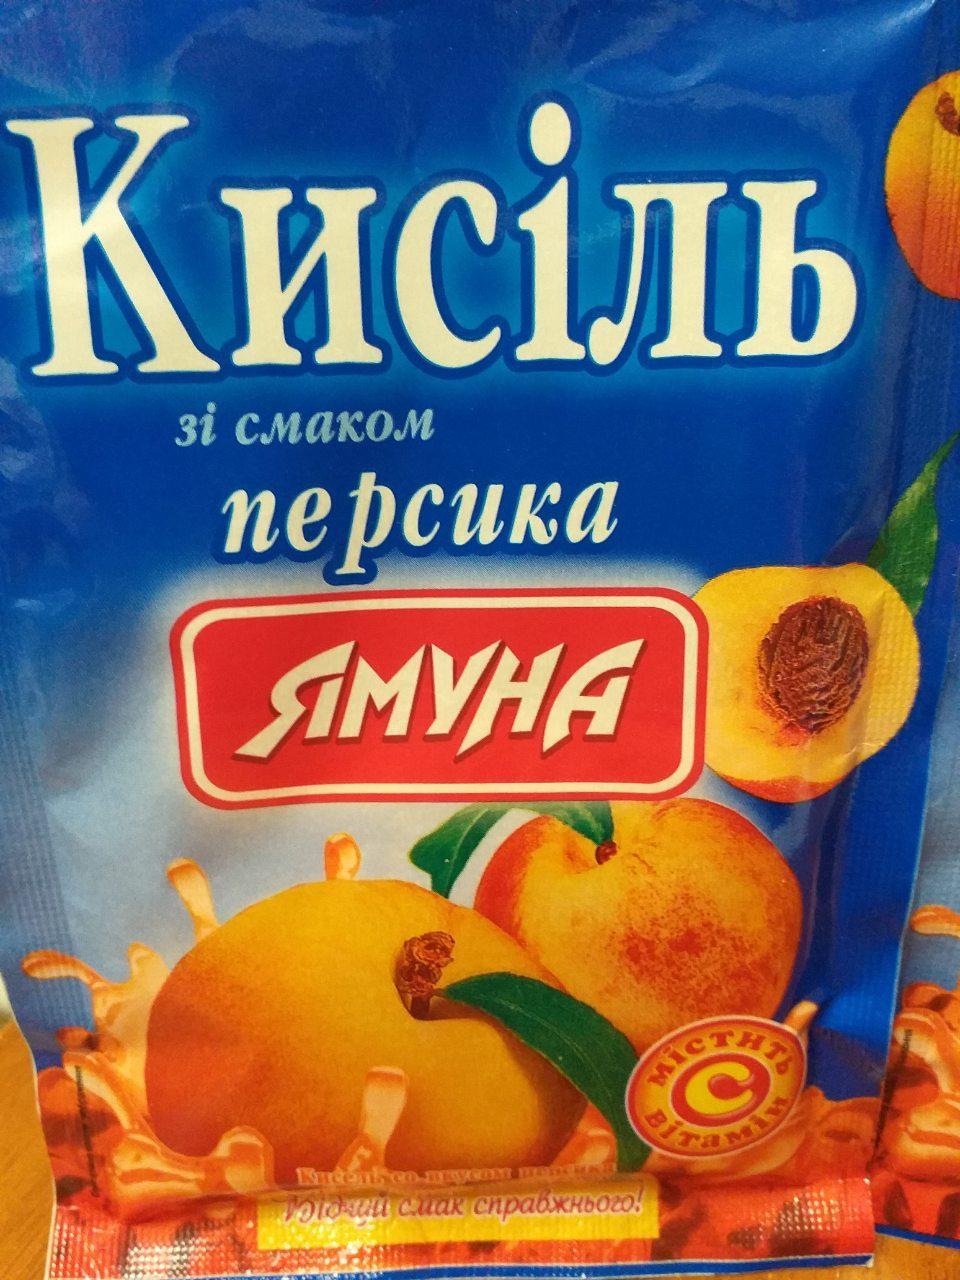 Кисель вкус Персика 65 грамм